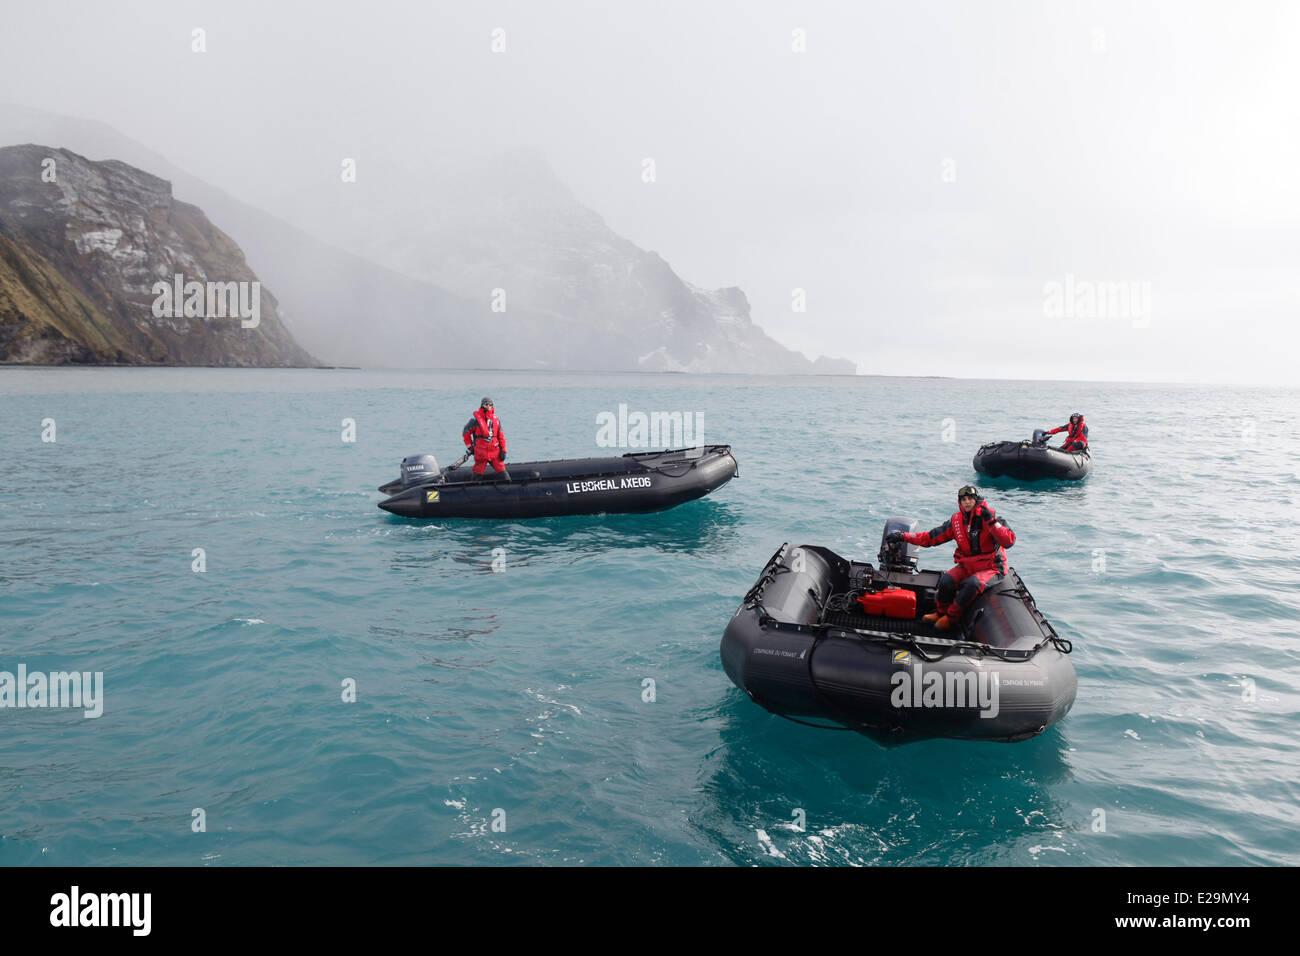 Antarctica, cruise on Boreal ship, South Georgia Island - Stock Image